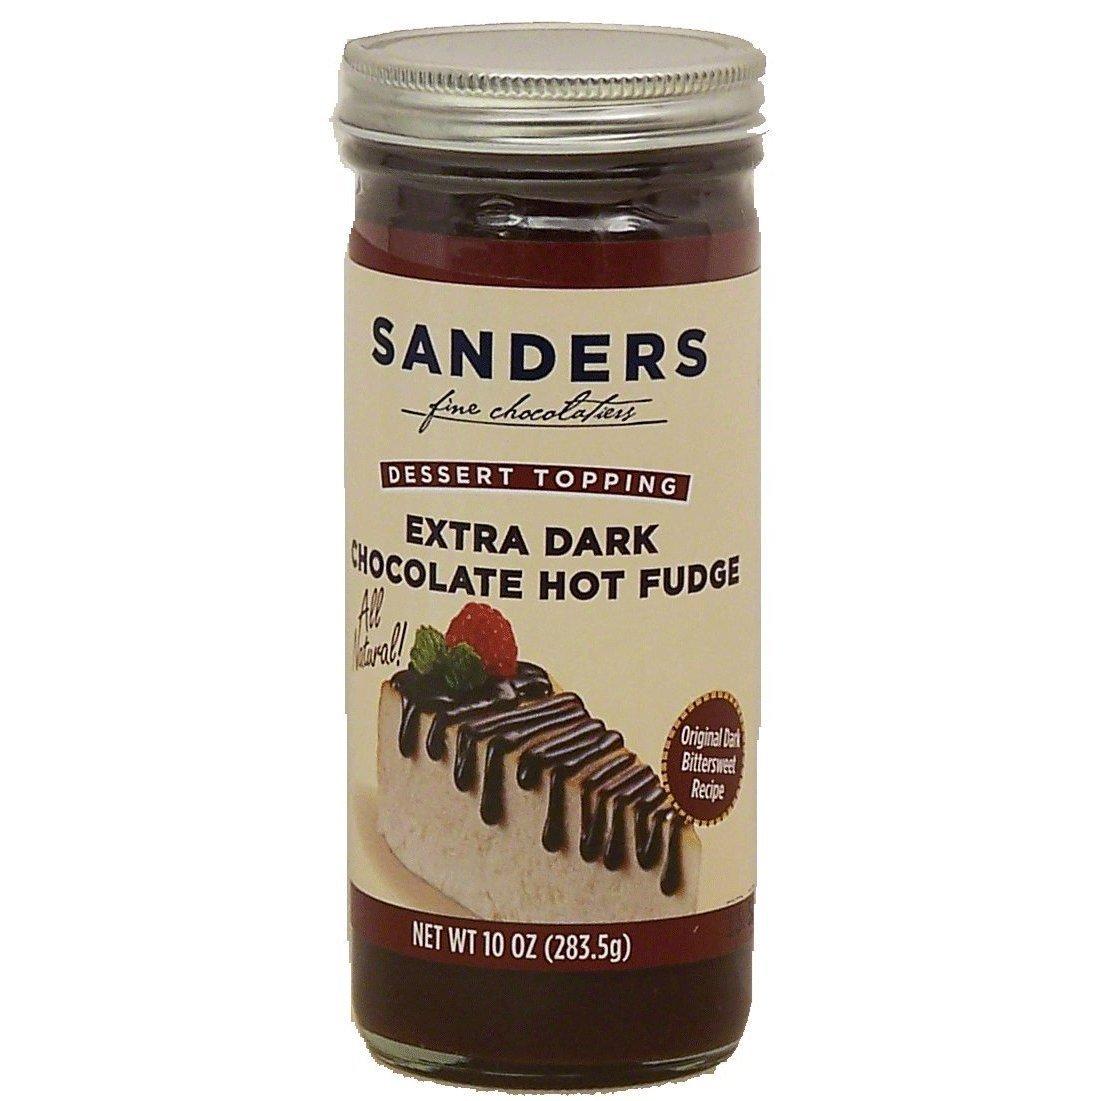 Sanders Assortment Milk Chocolate Hot Fudge, Classic Caramel and Extra Dark Chocolate Hot Fudge Dessert Topping 10 Oz (Pack of 3)